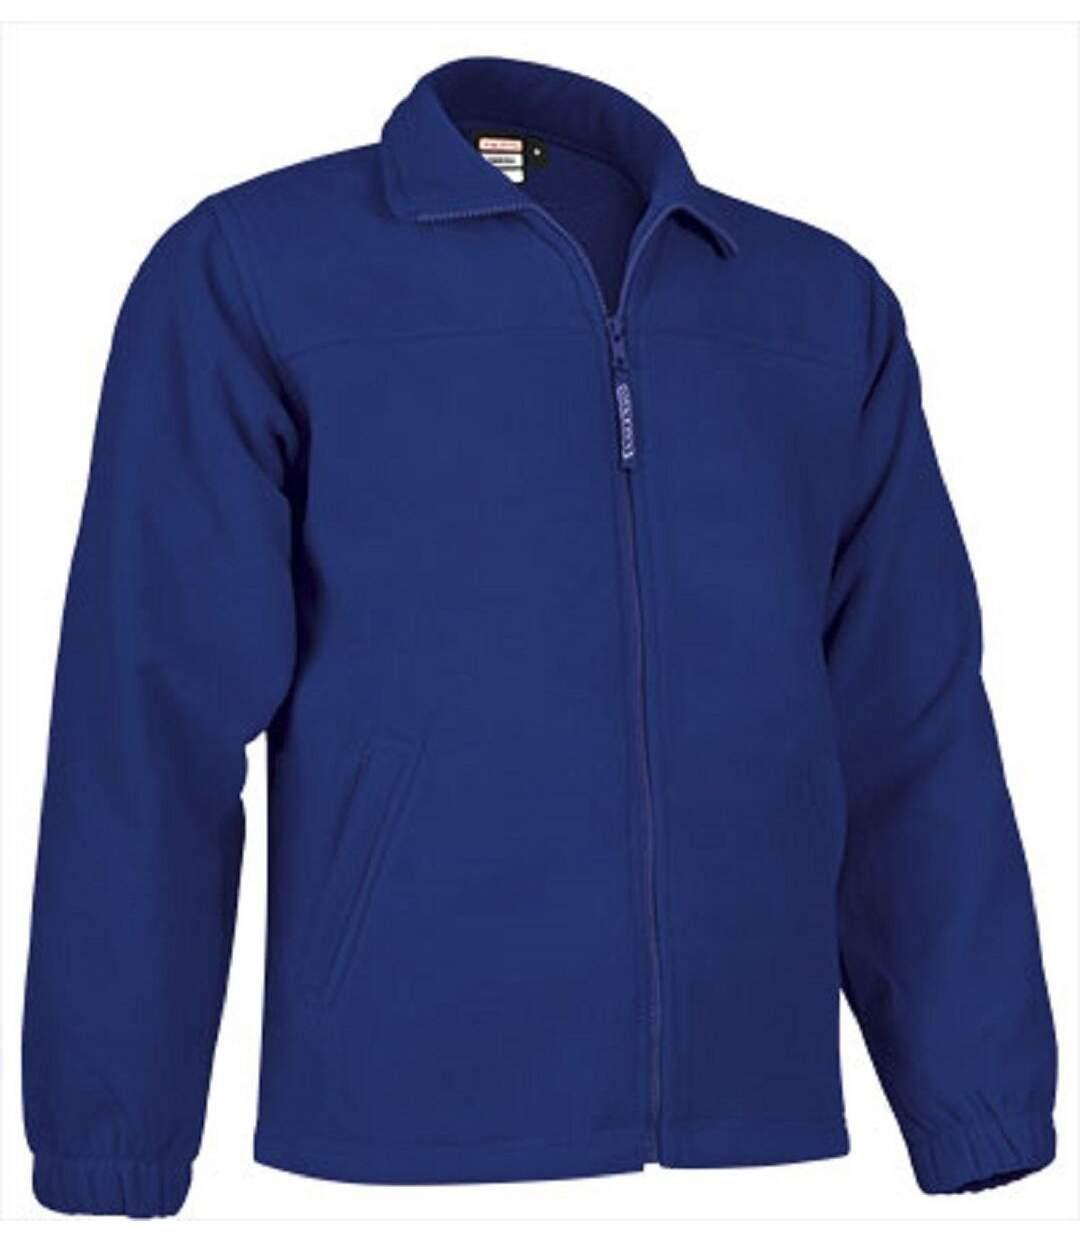 Veste polaire zippée - Homme - REF DAKOTA - bleu azur